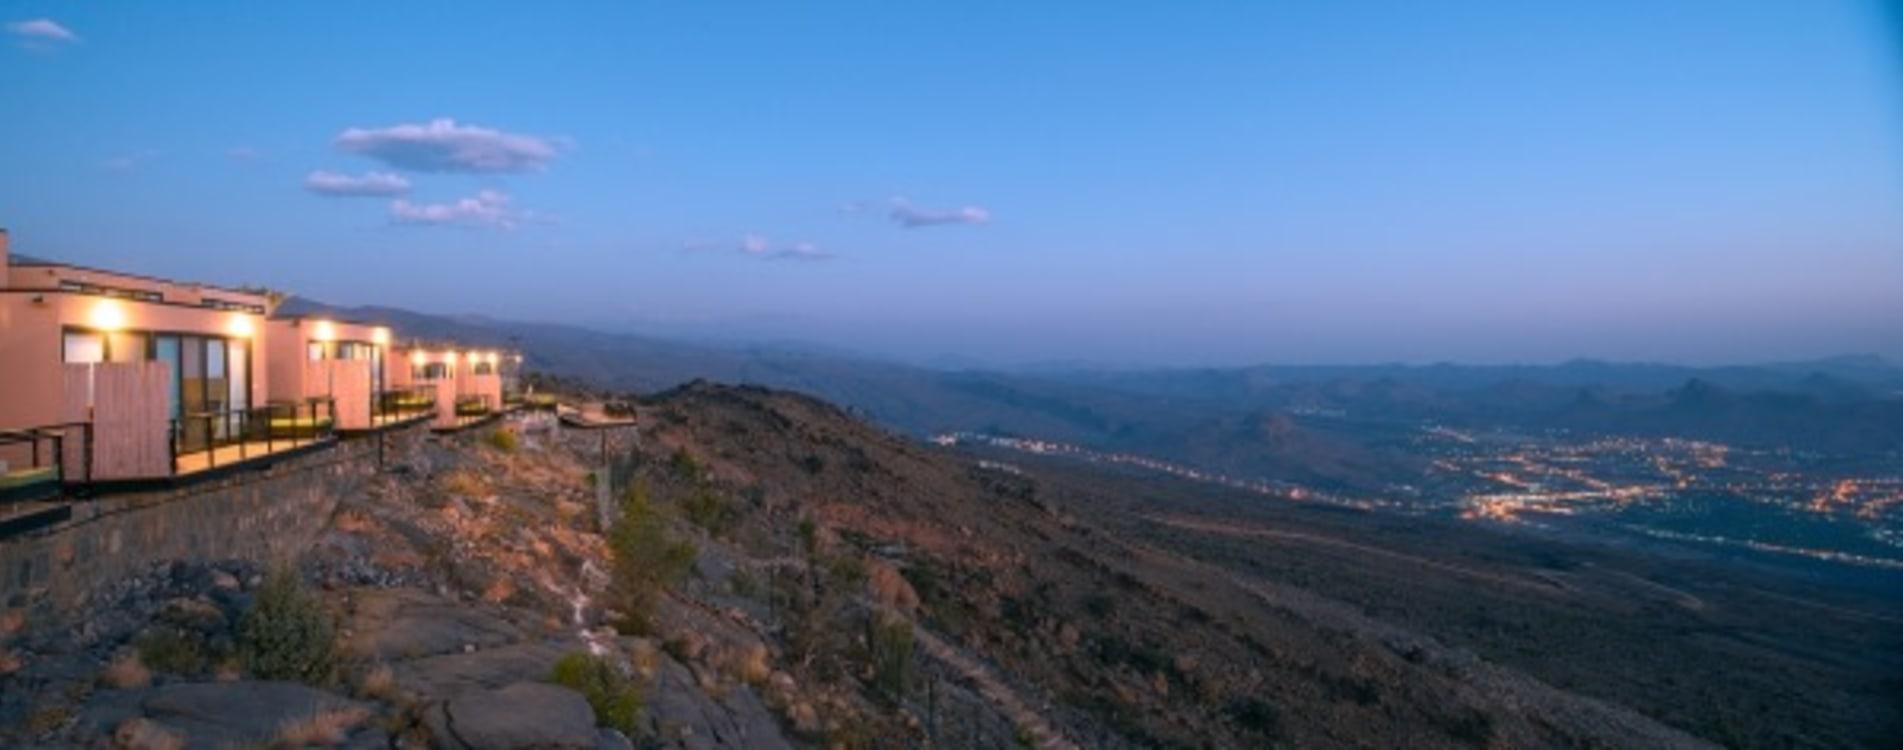 The-View-Oman-Panorama-Ausblick.jpg